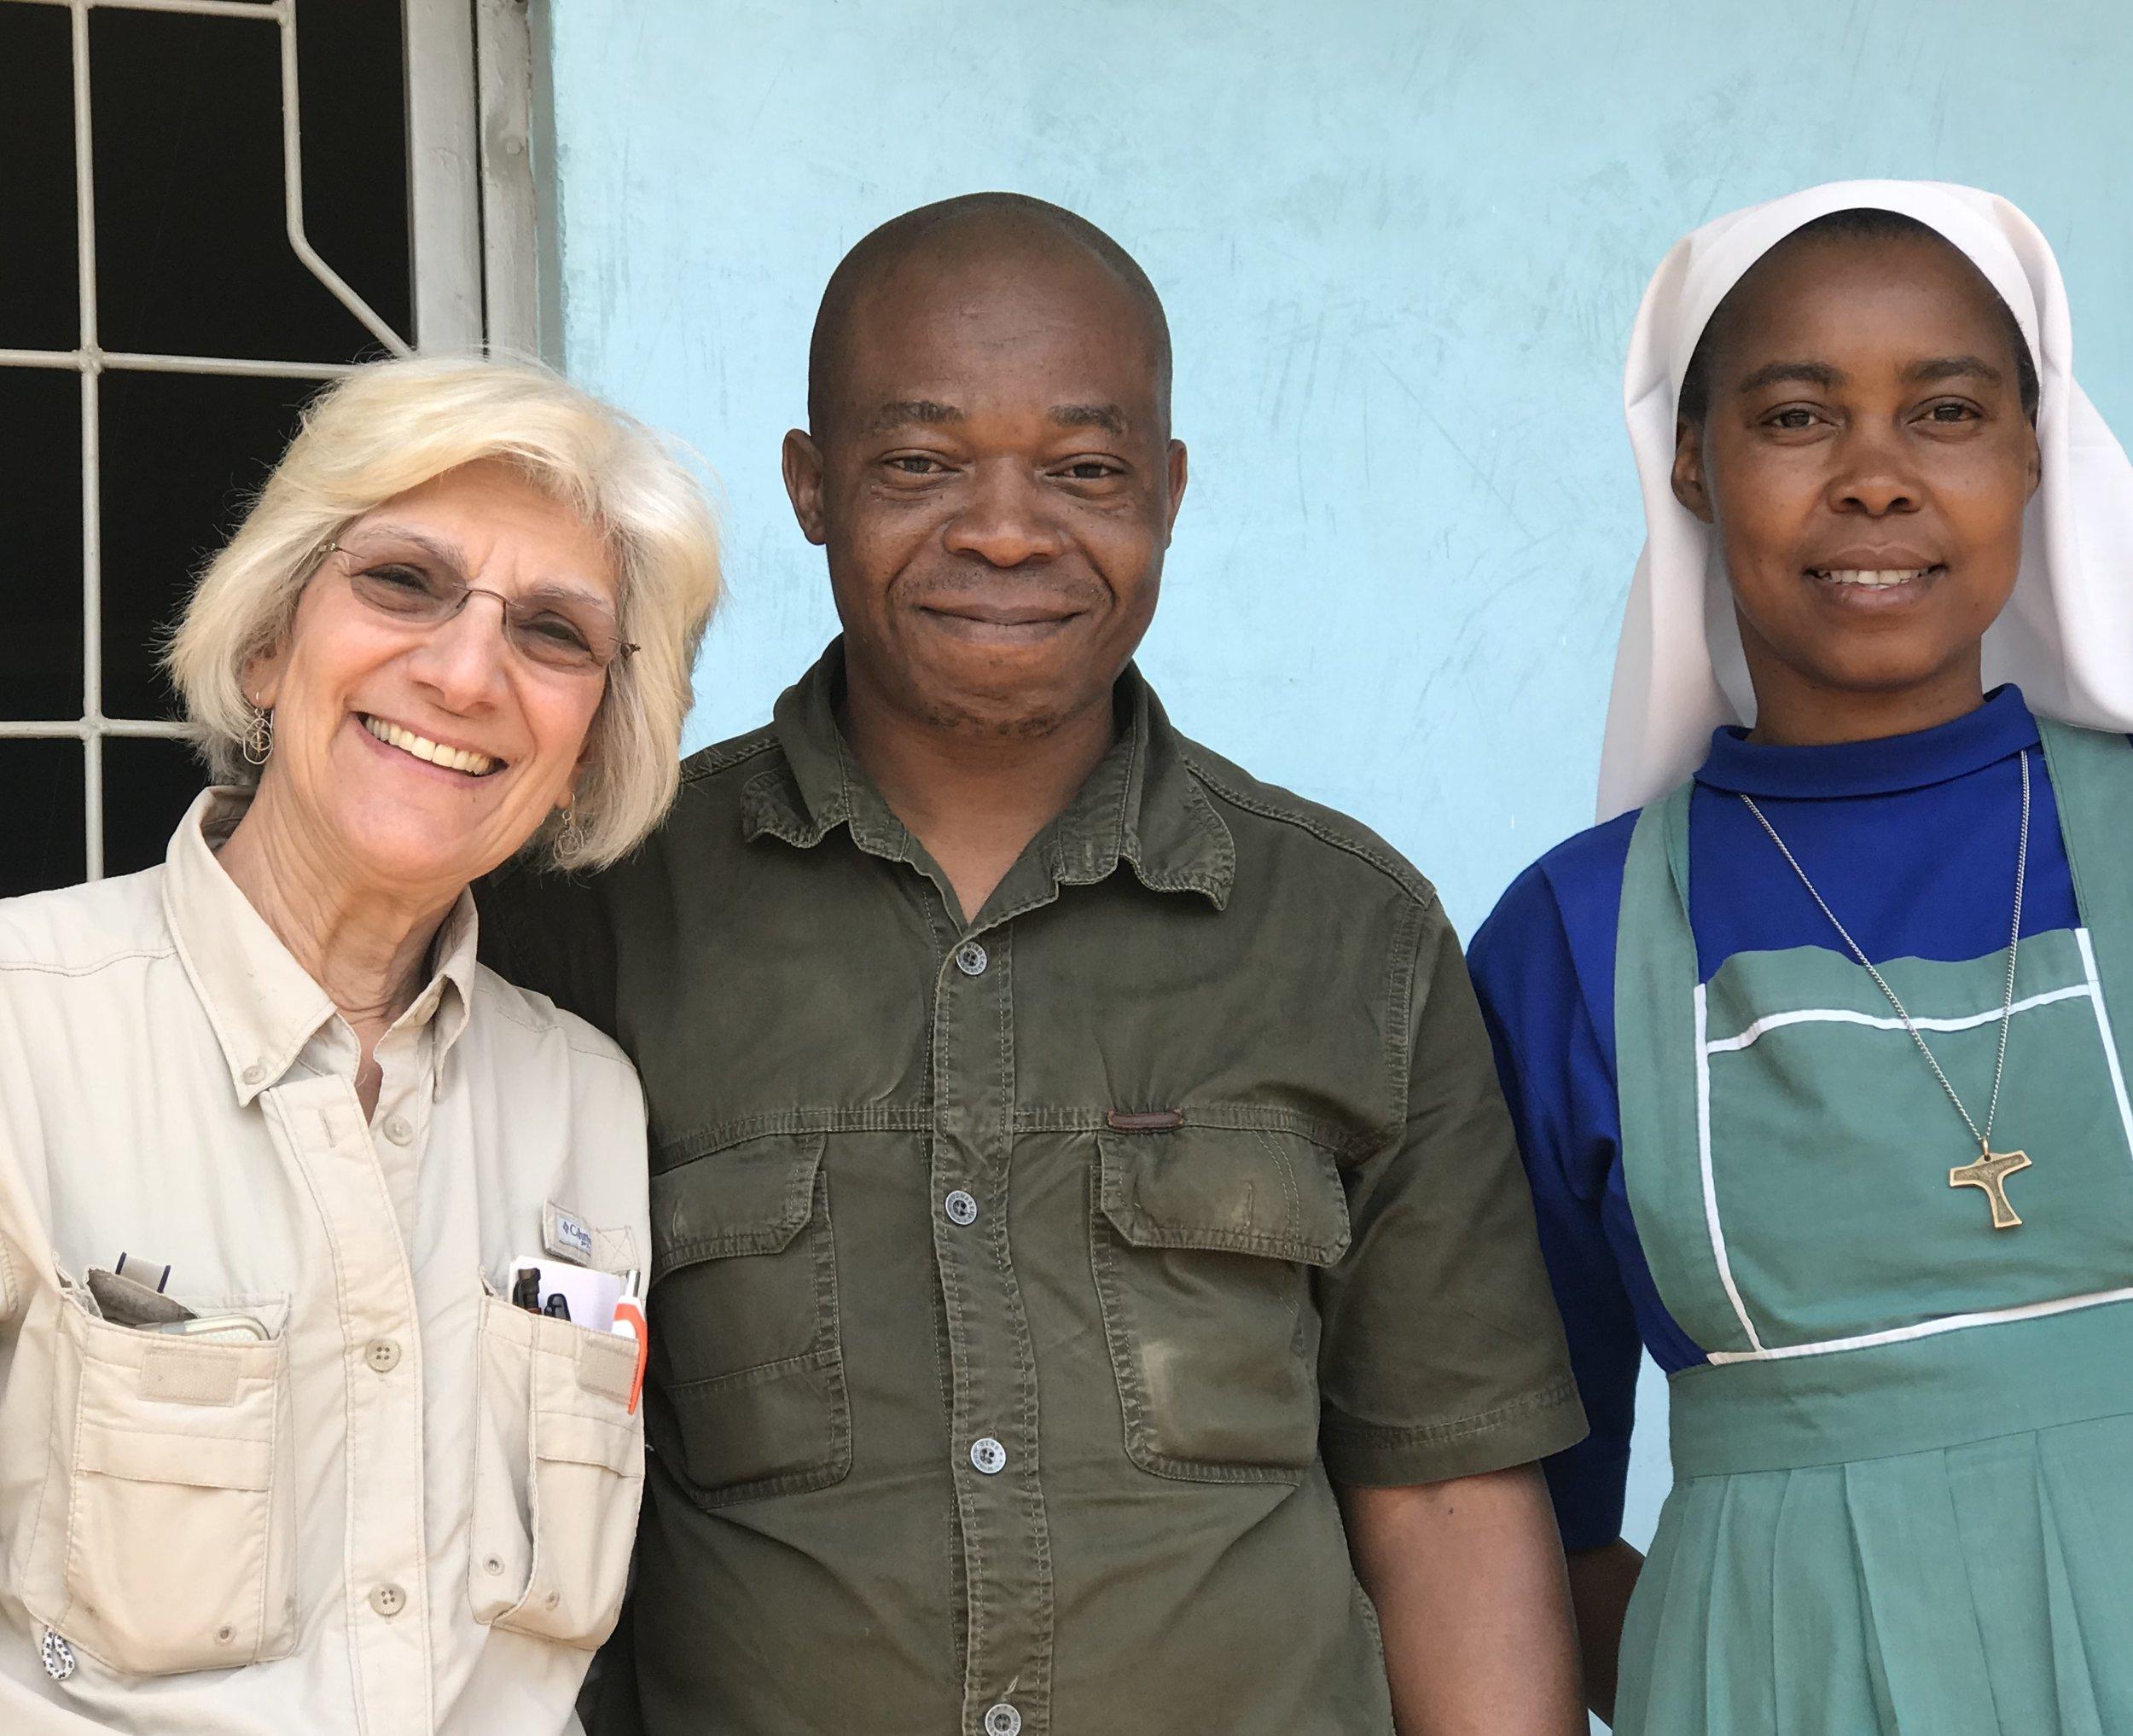 Mr. Ramadan Mugenyi (center) with Johanna Burani (left) and Sr. Dativa (right)